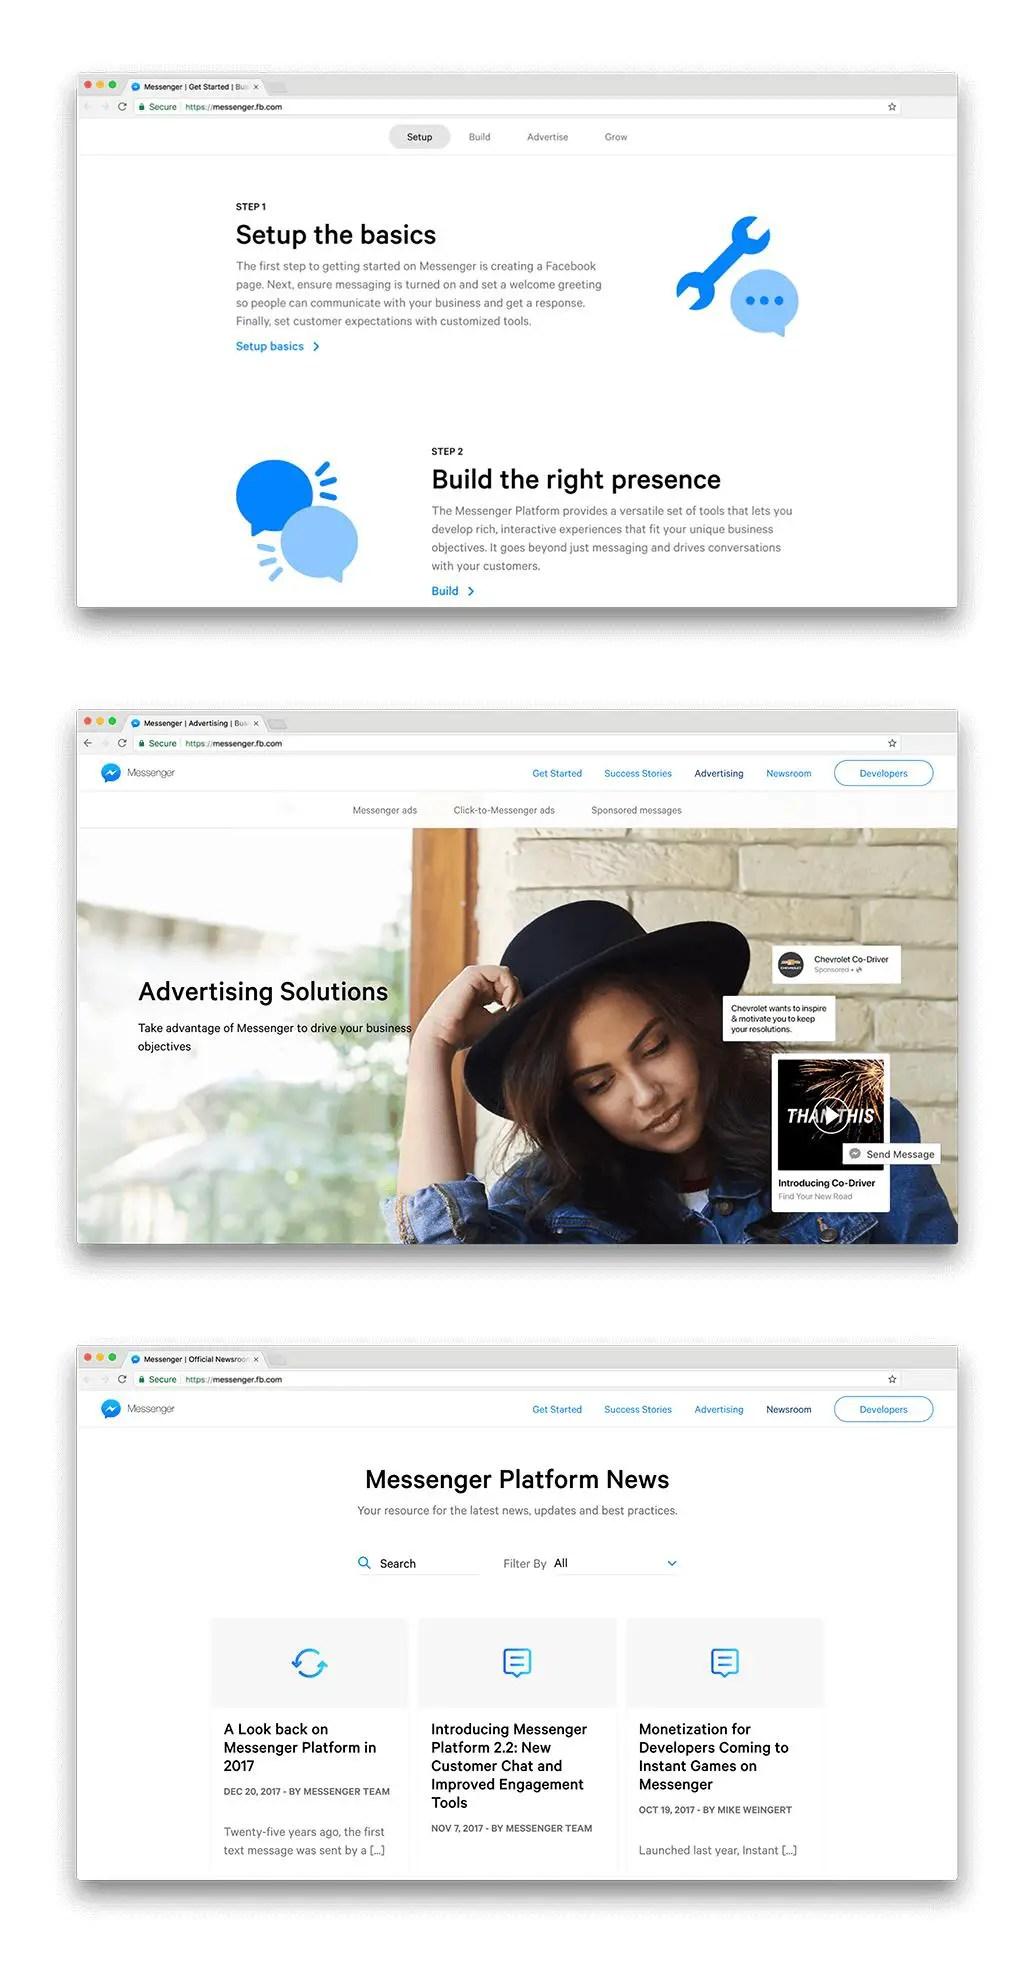 wersm-facebook-messenger-platform